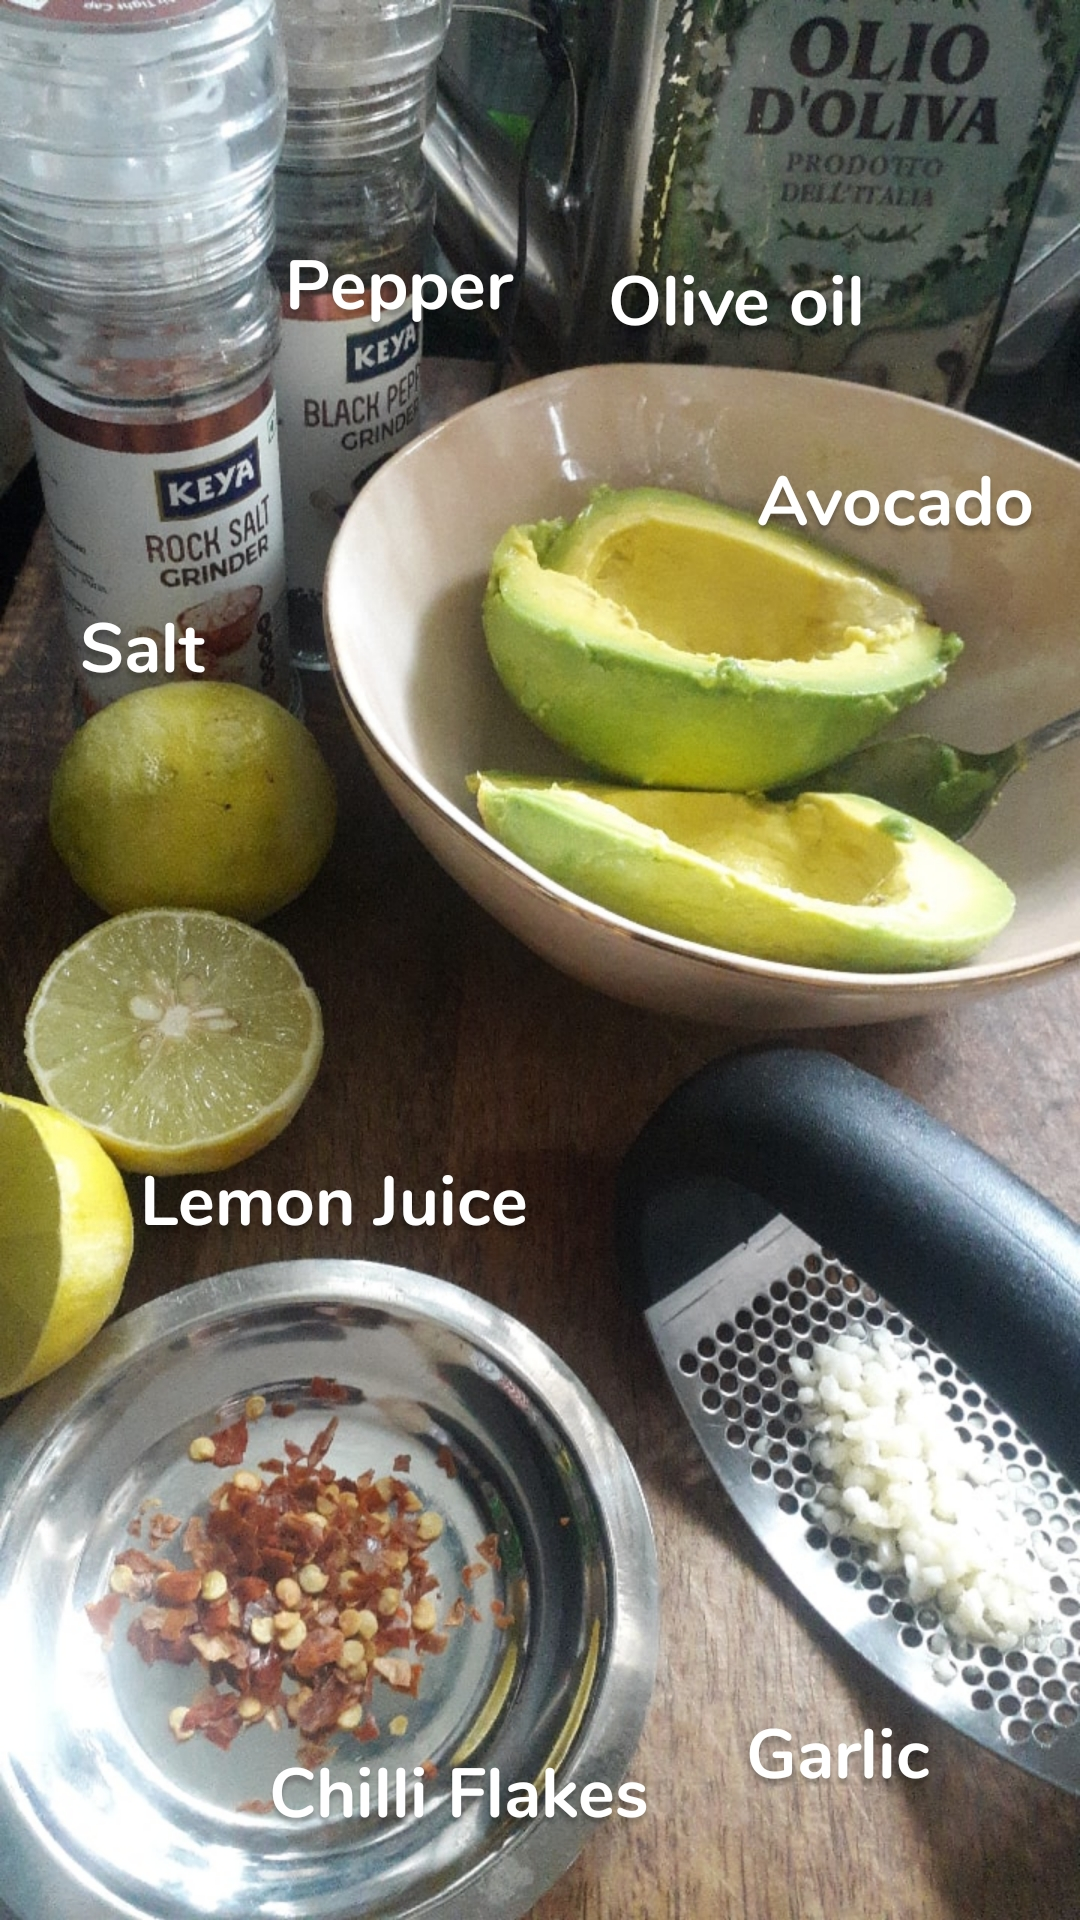 Garlic Lemon Juice Chilli Flakes Olive oil Salt Pepper Avocado